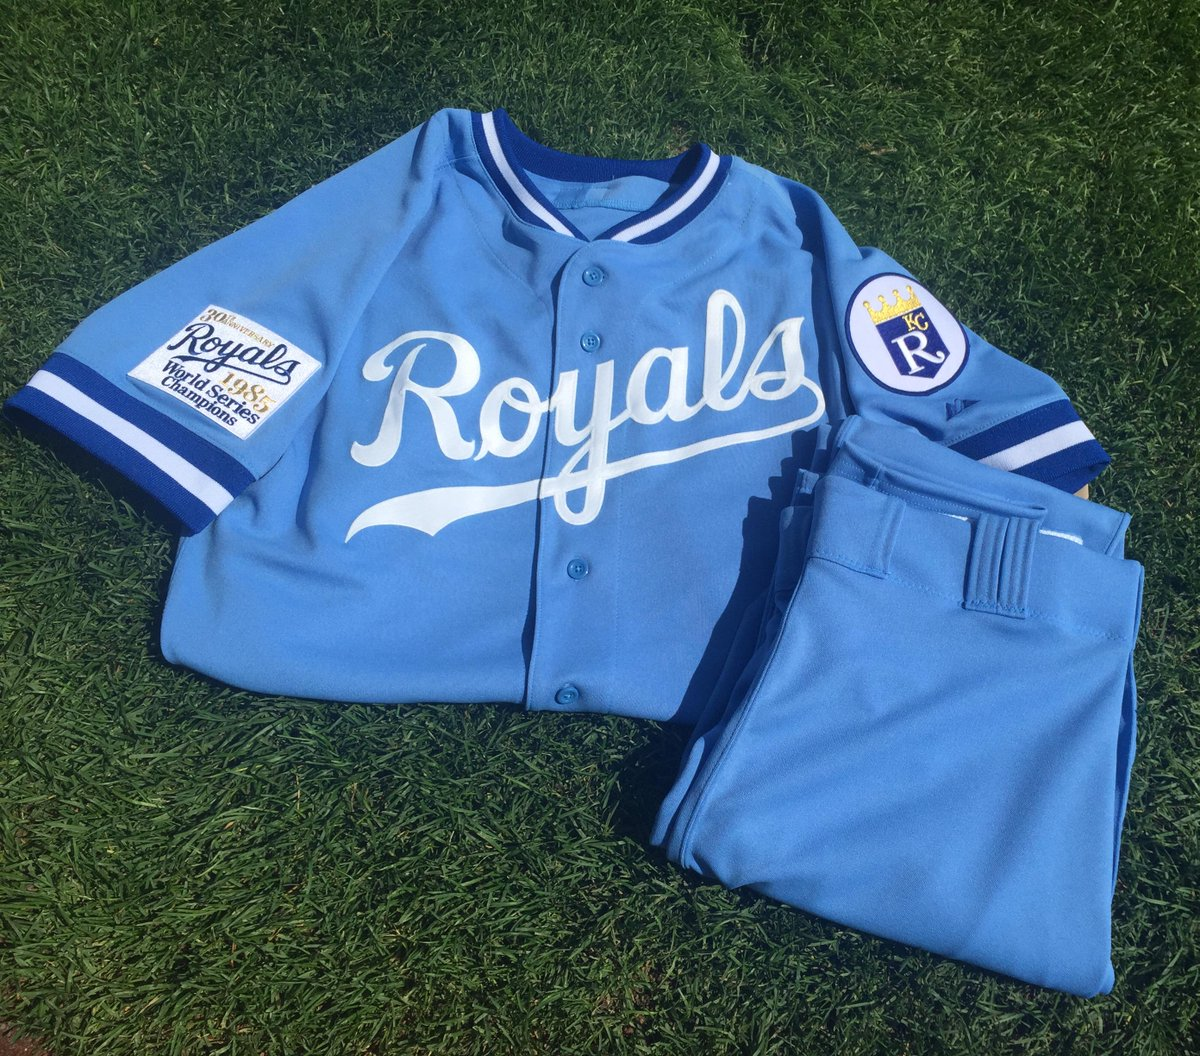 lowest price fdffa 4b032 Kansas City Royals on Twitter: